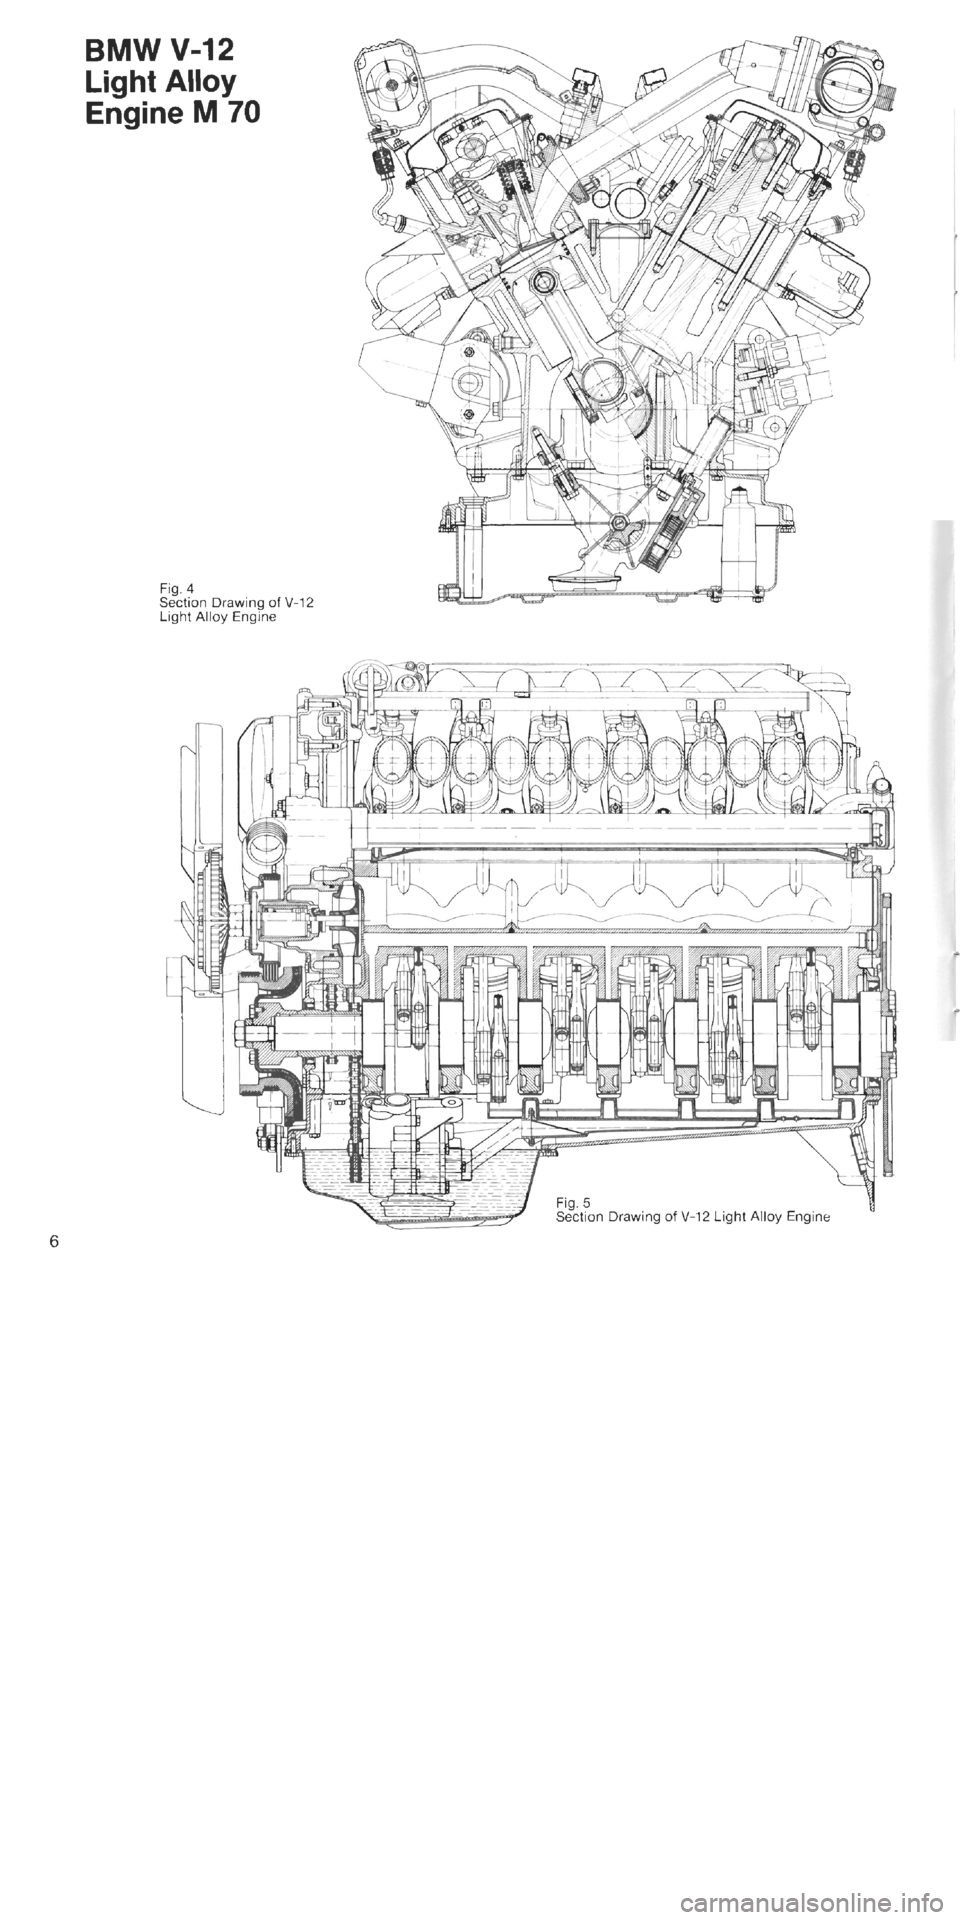 bmw 850i 1994 e31 m70 engine workshop manual